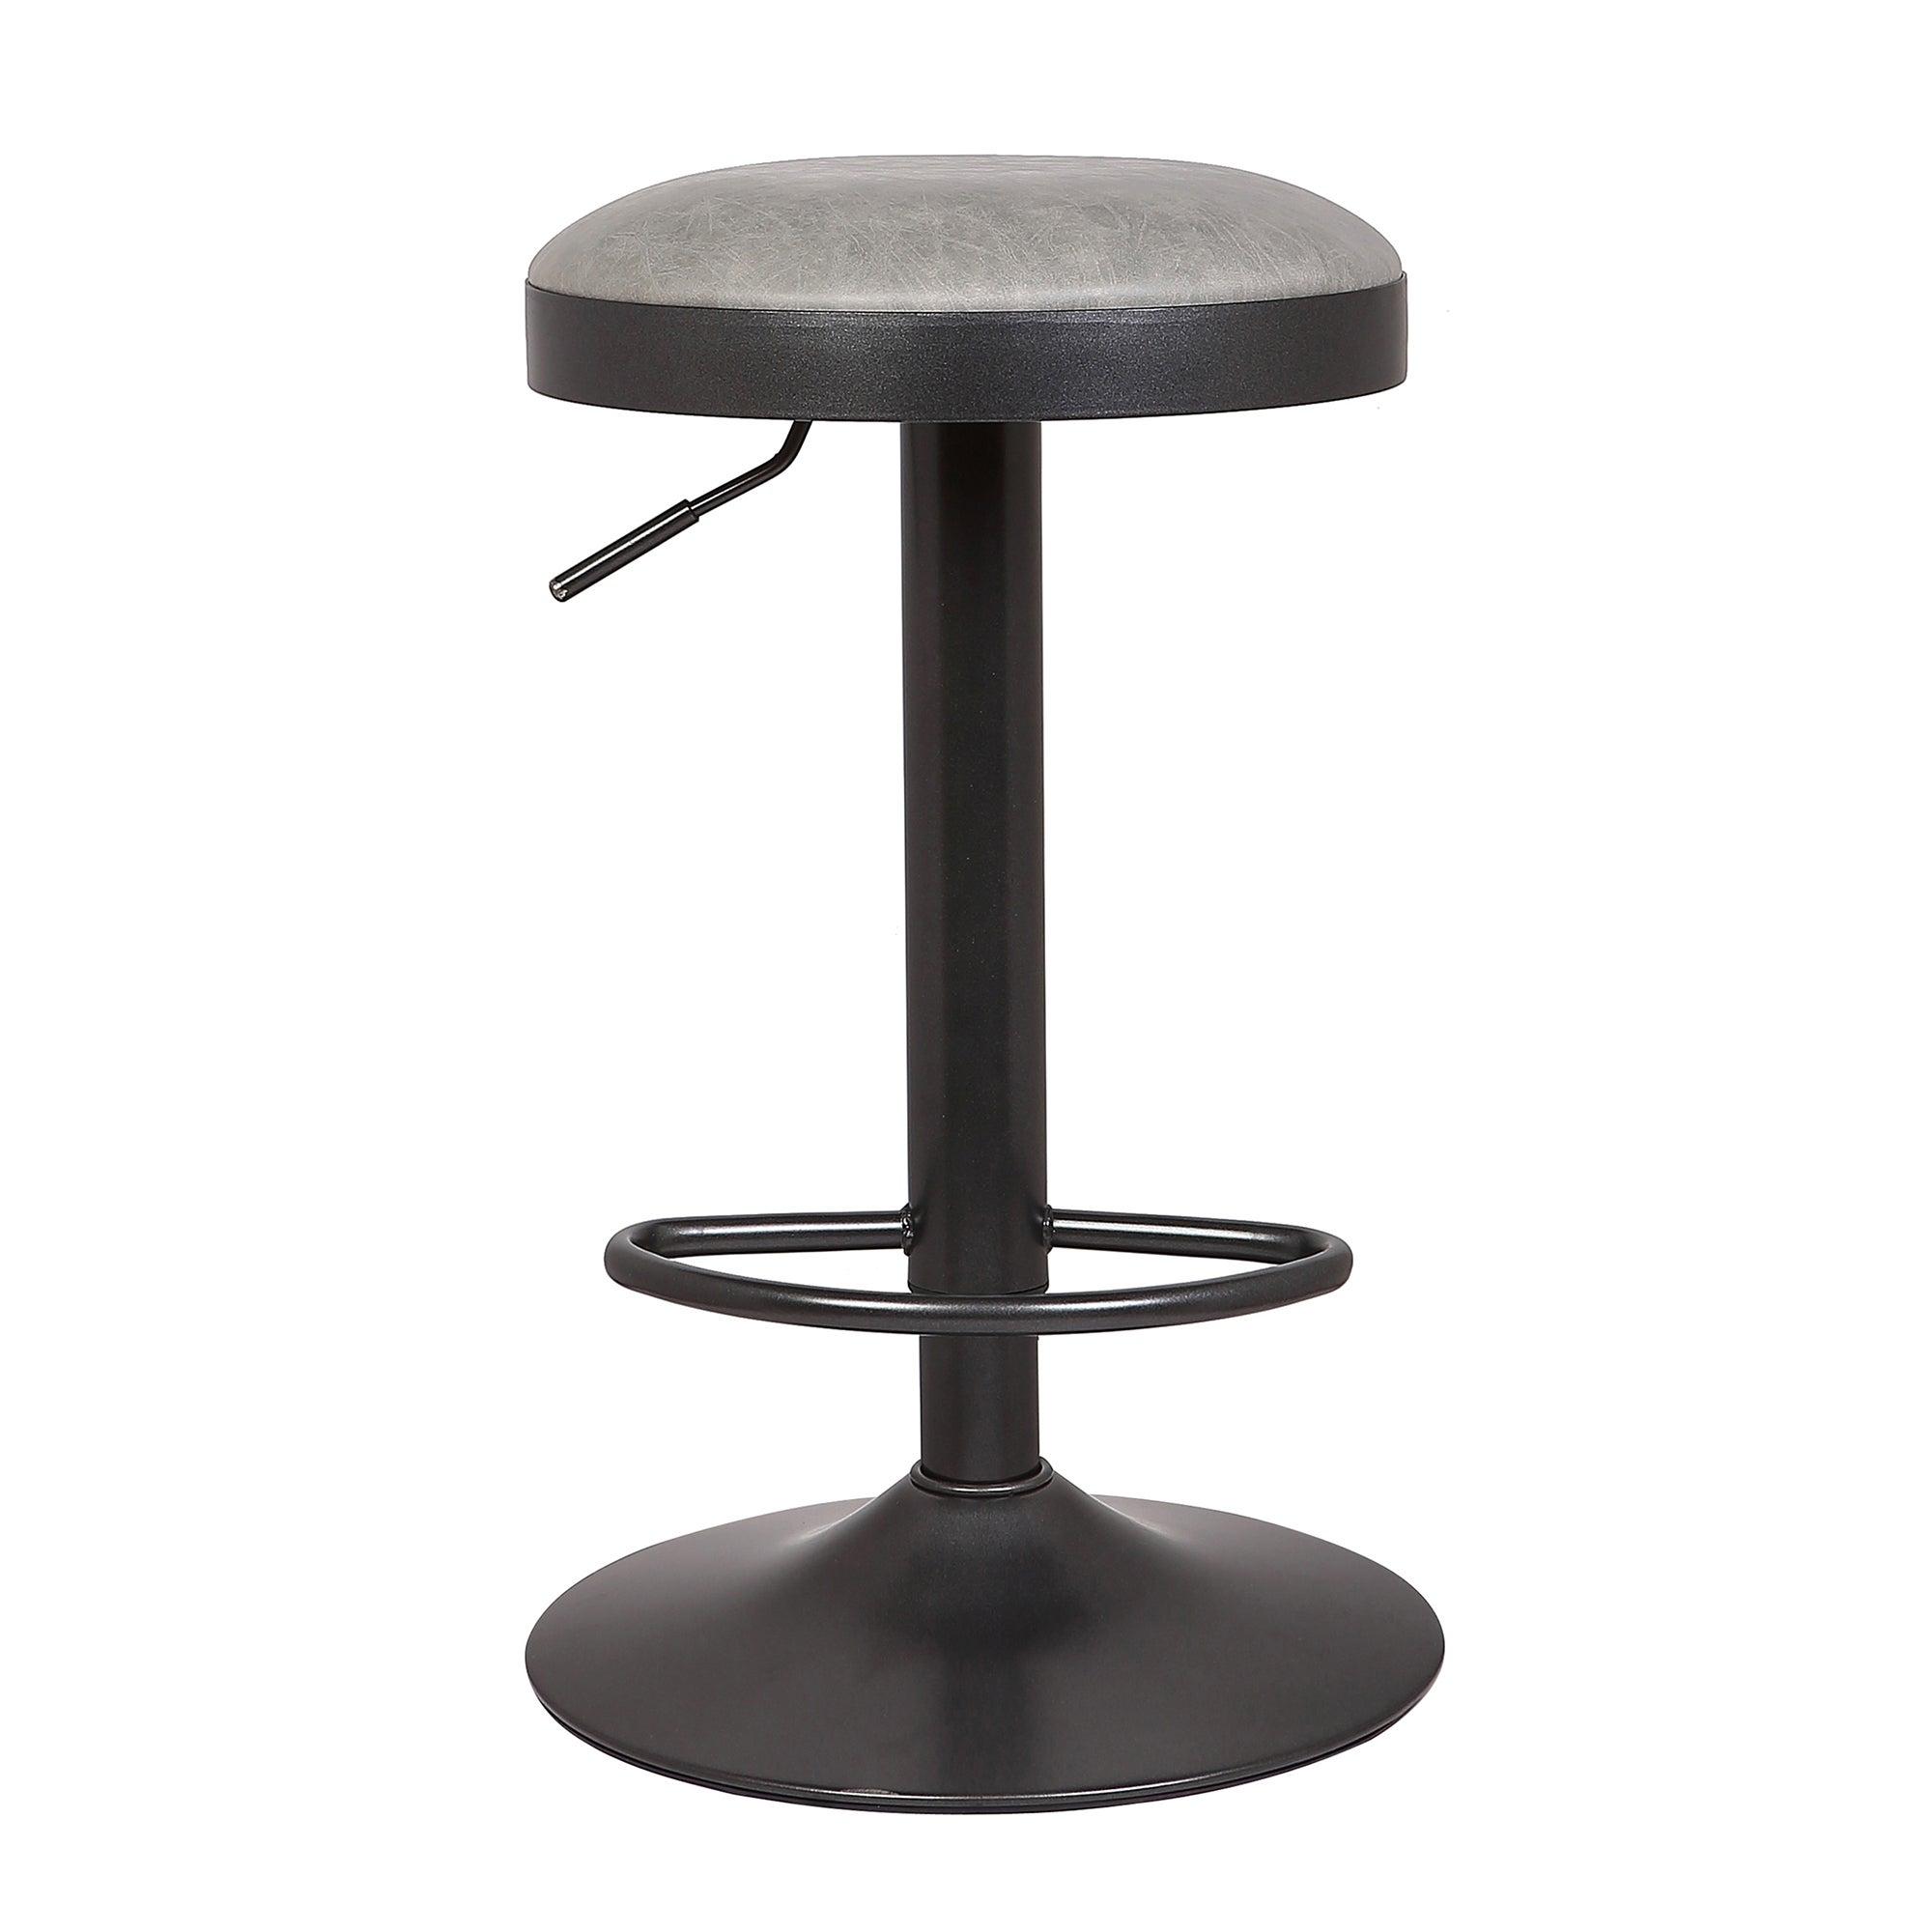 Terni Bar Stool Grey PU Leather Grey